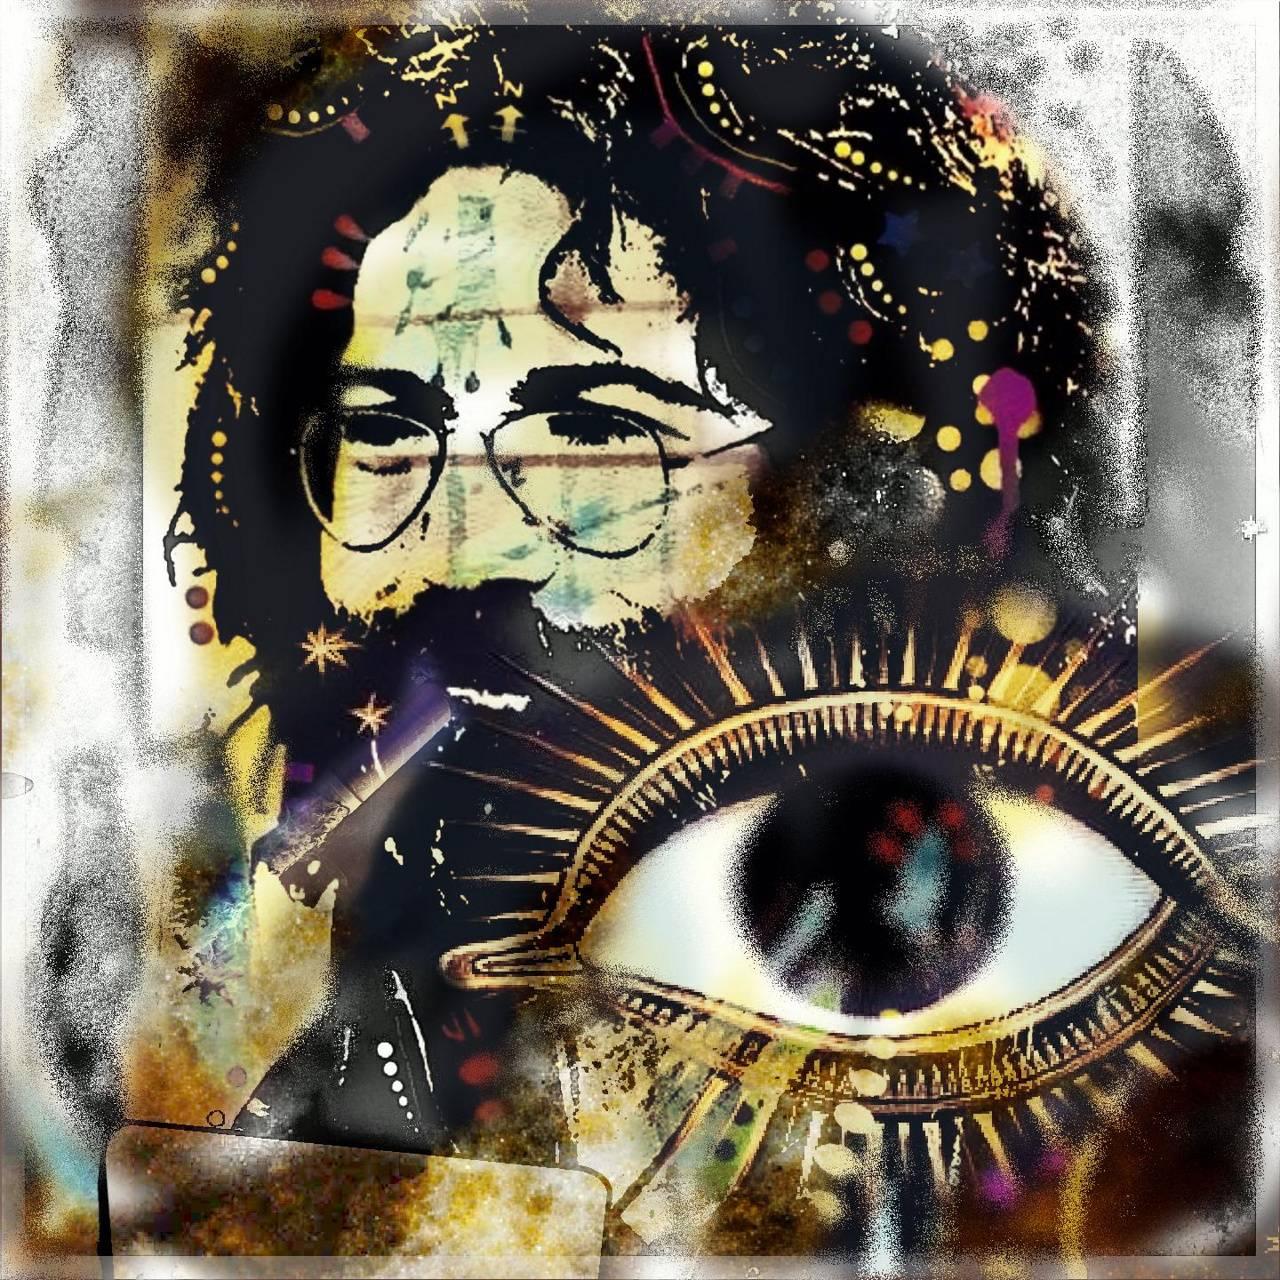 Eye see Garcia